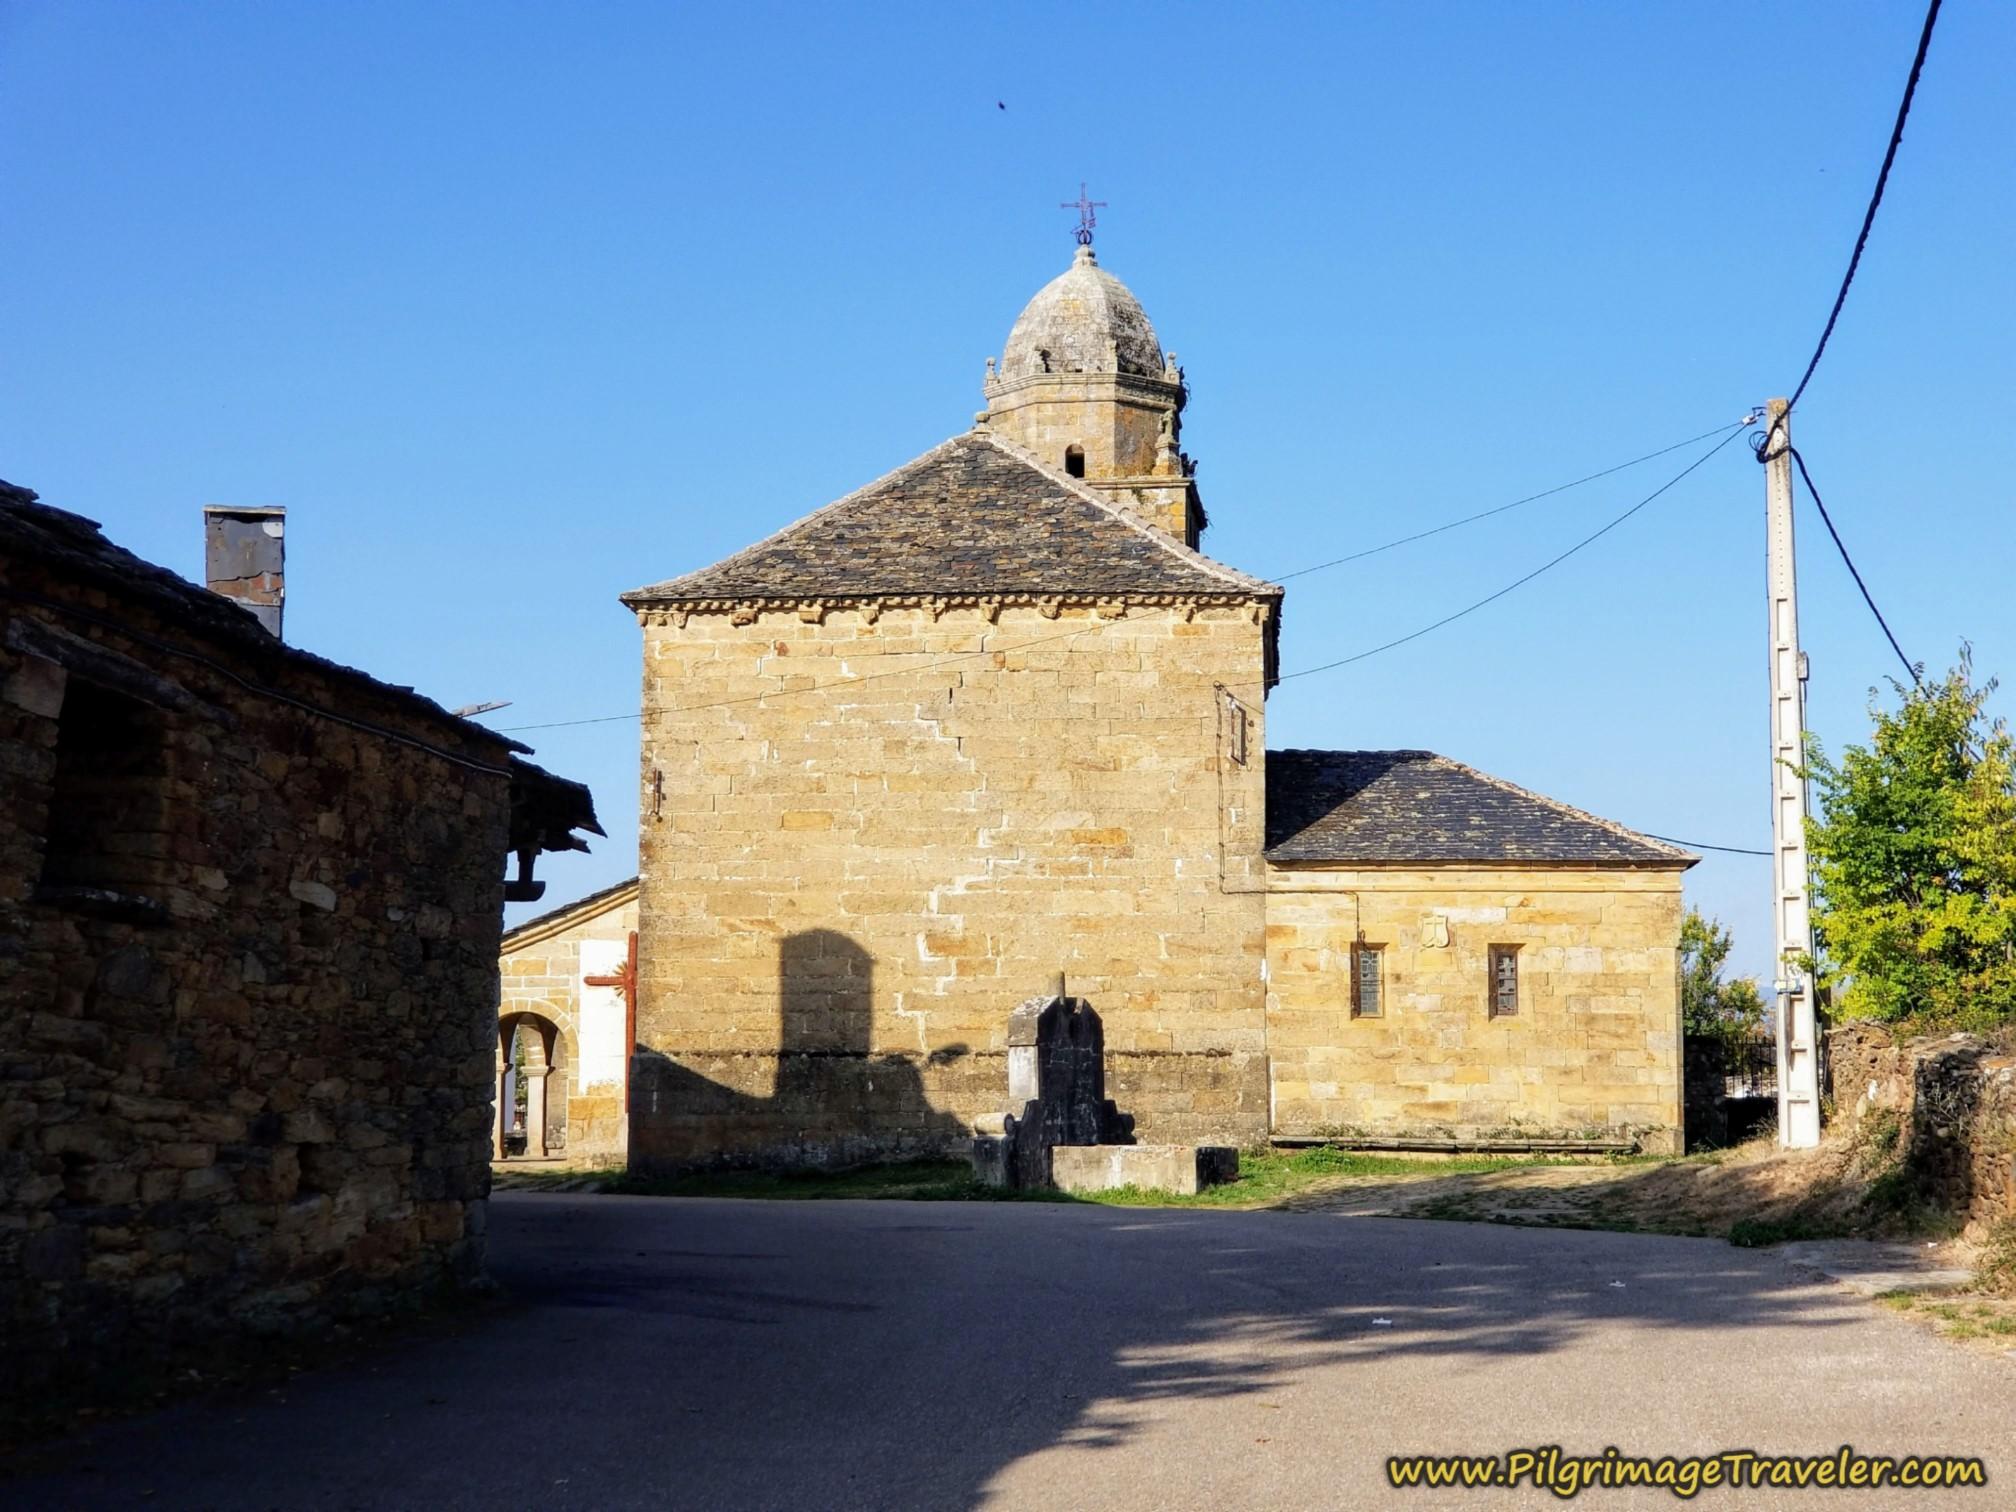 Pass the Iglesia de Santo Tomás Apóstol